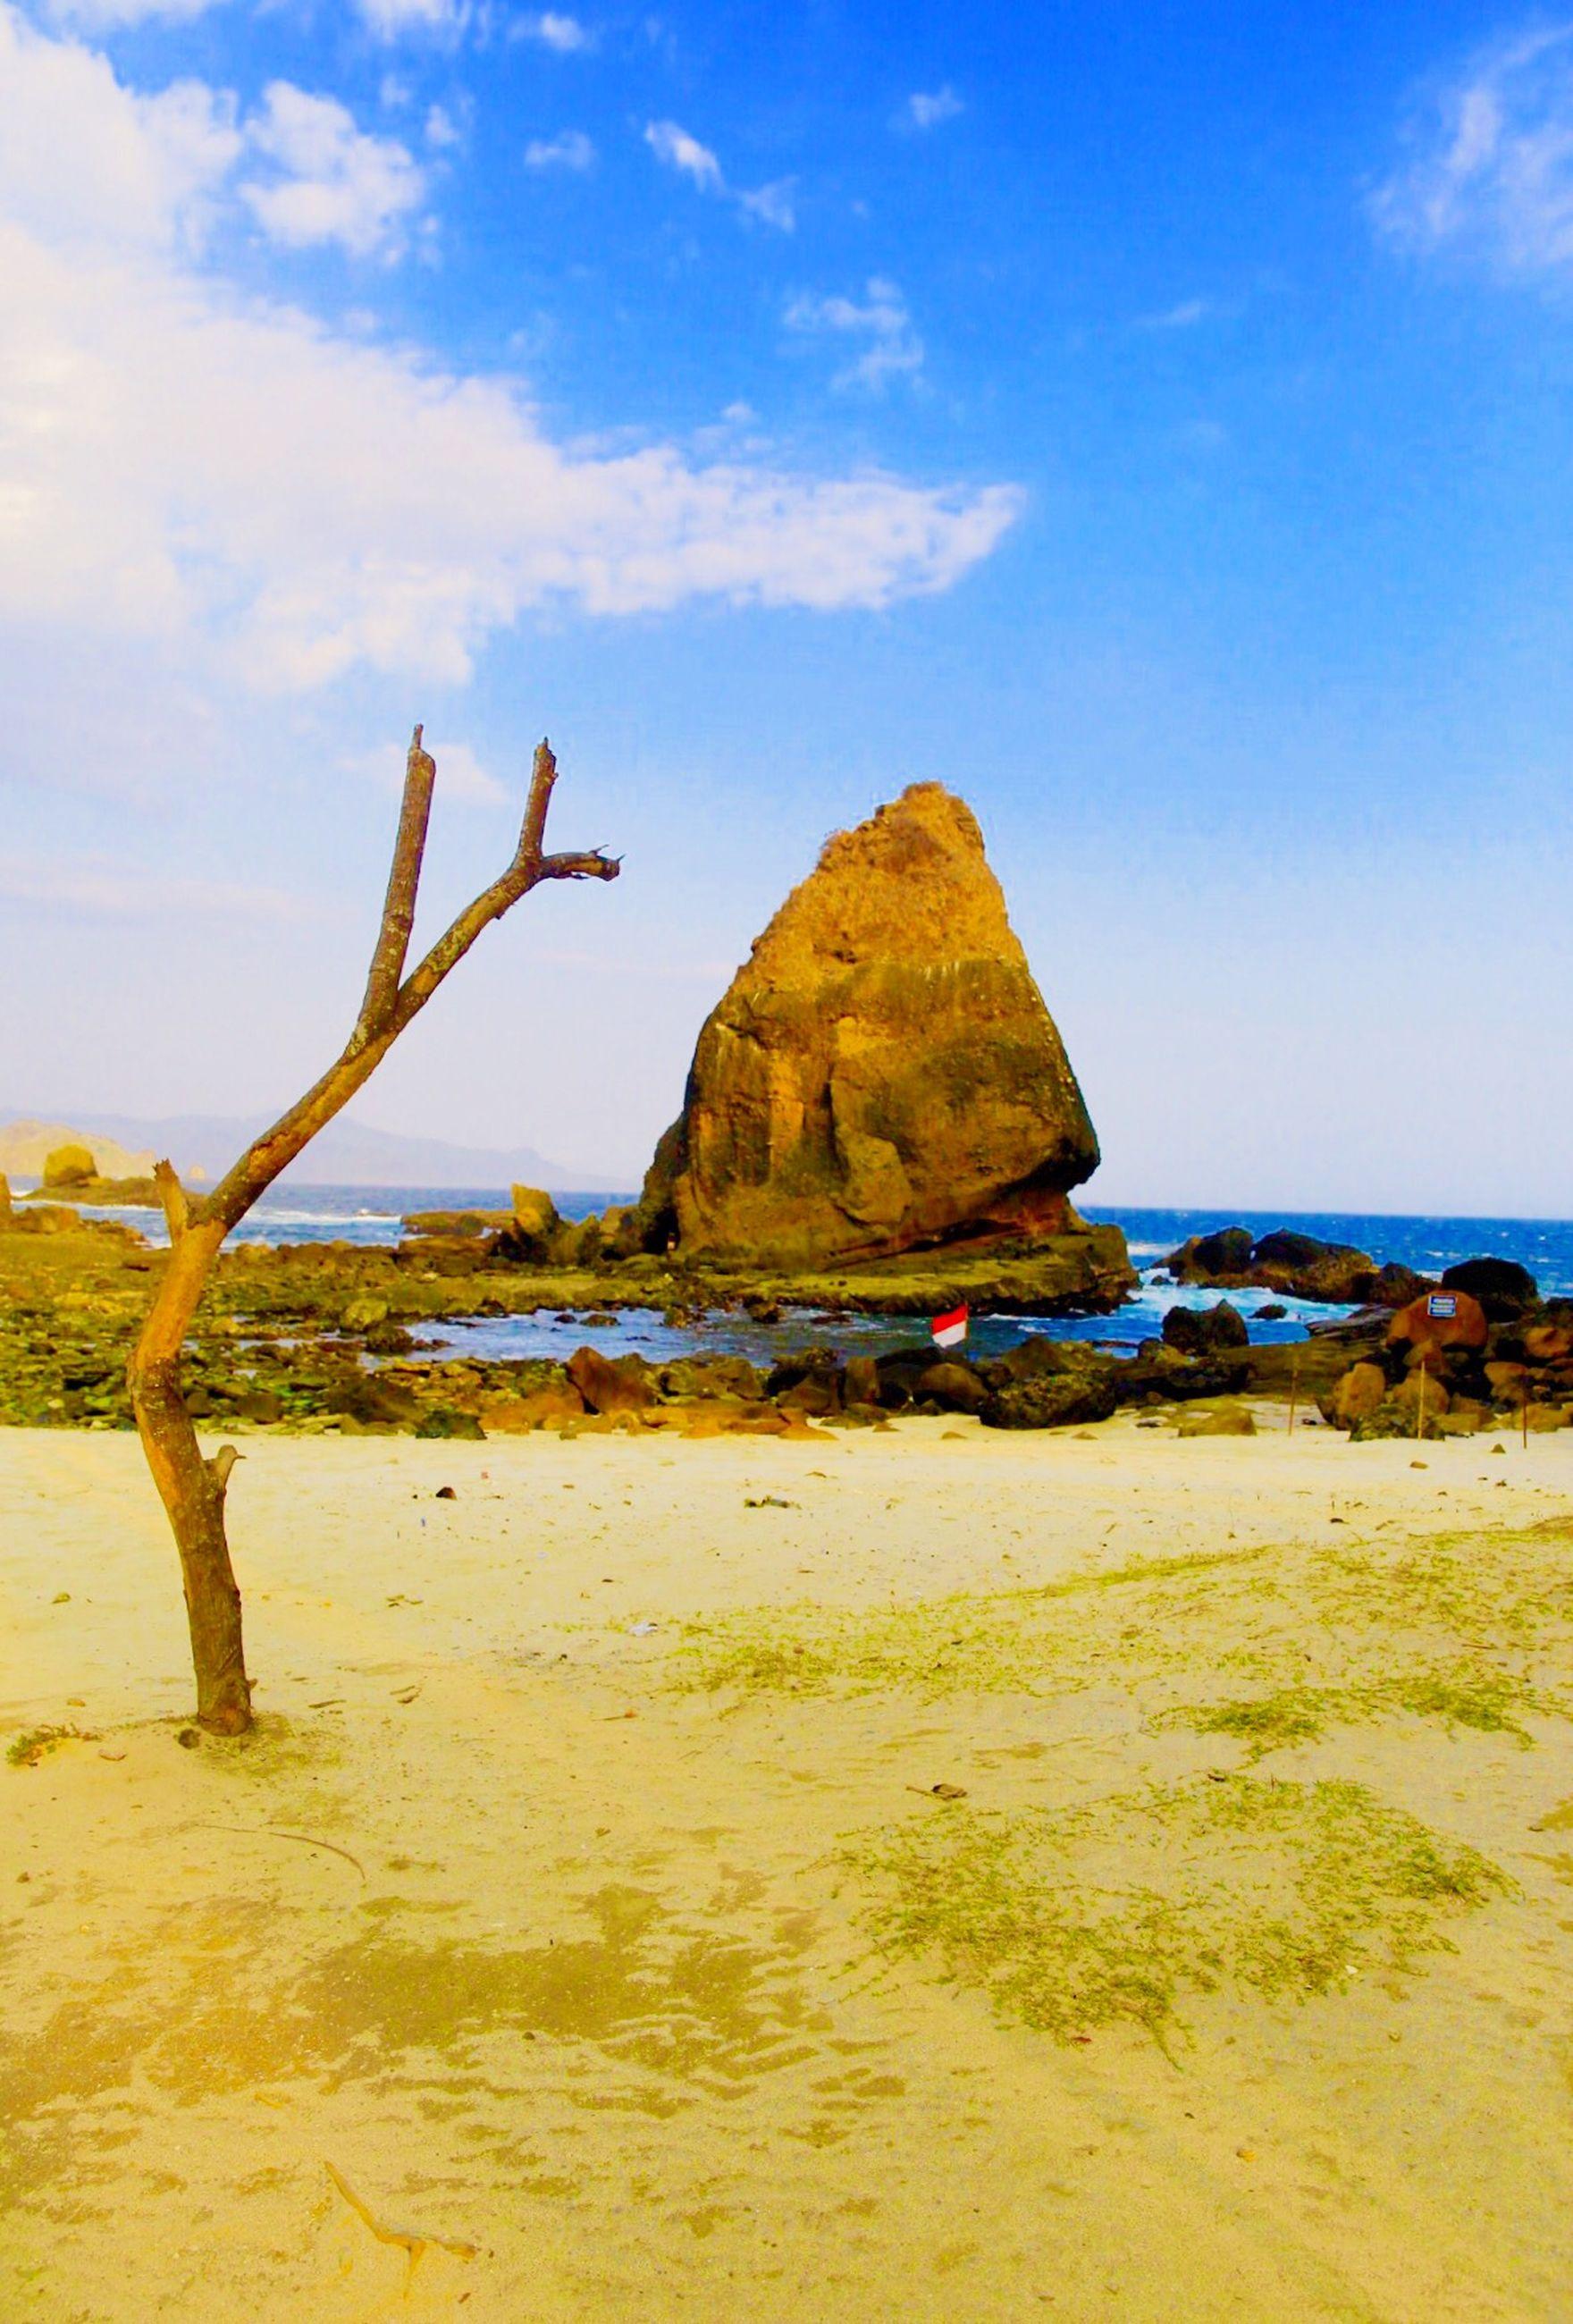 sea, beach, sky, tranquil scene, tranquility, water, scenics, sand, beauty in nature, horizon over water, nature, shore, blue, cloud, mountain, idyllic, day, non-urban scene, remote, sunlight